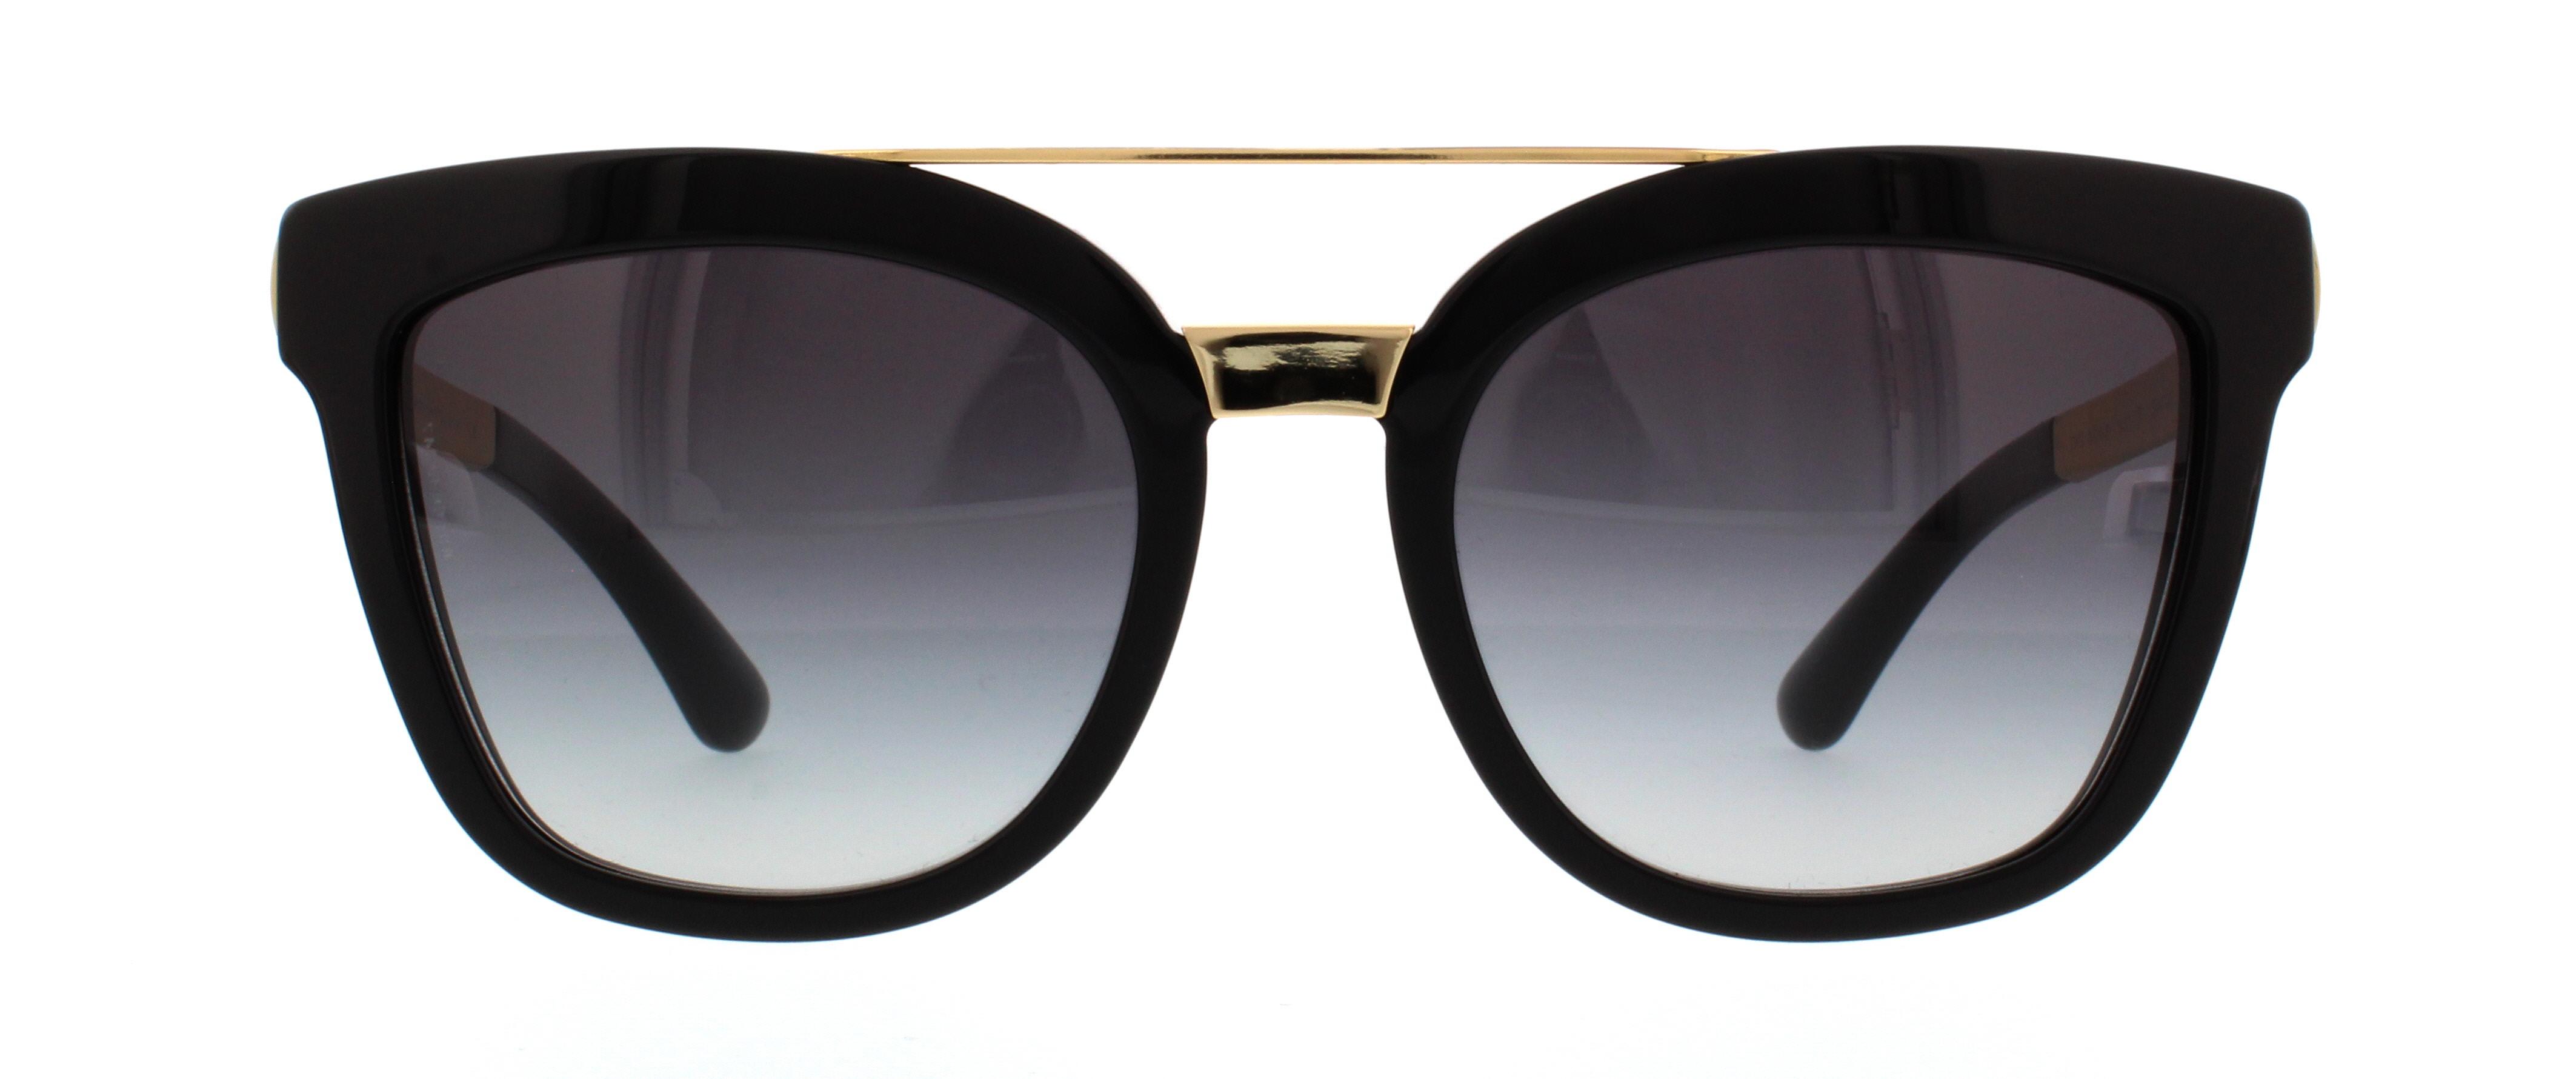 Dolce & Gabbana DG4269 501/8G 54 mm/20 mm gCdGEKh